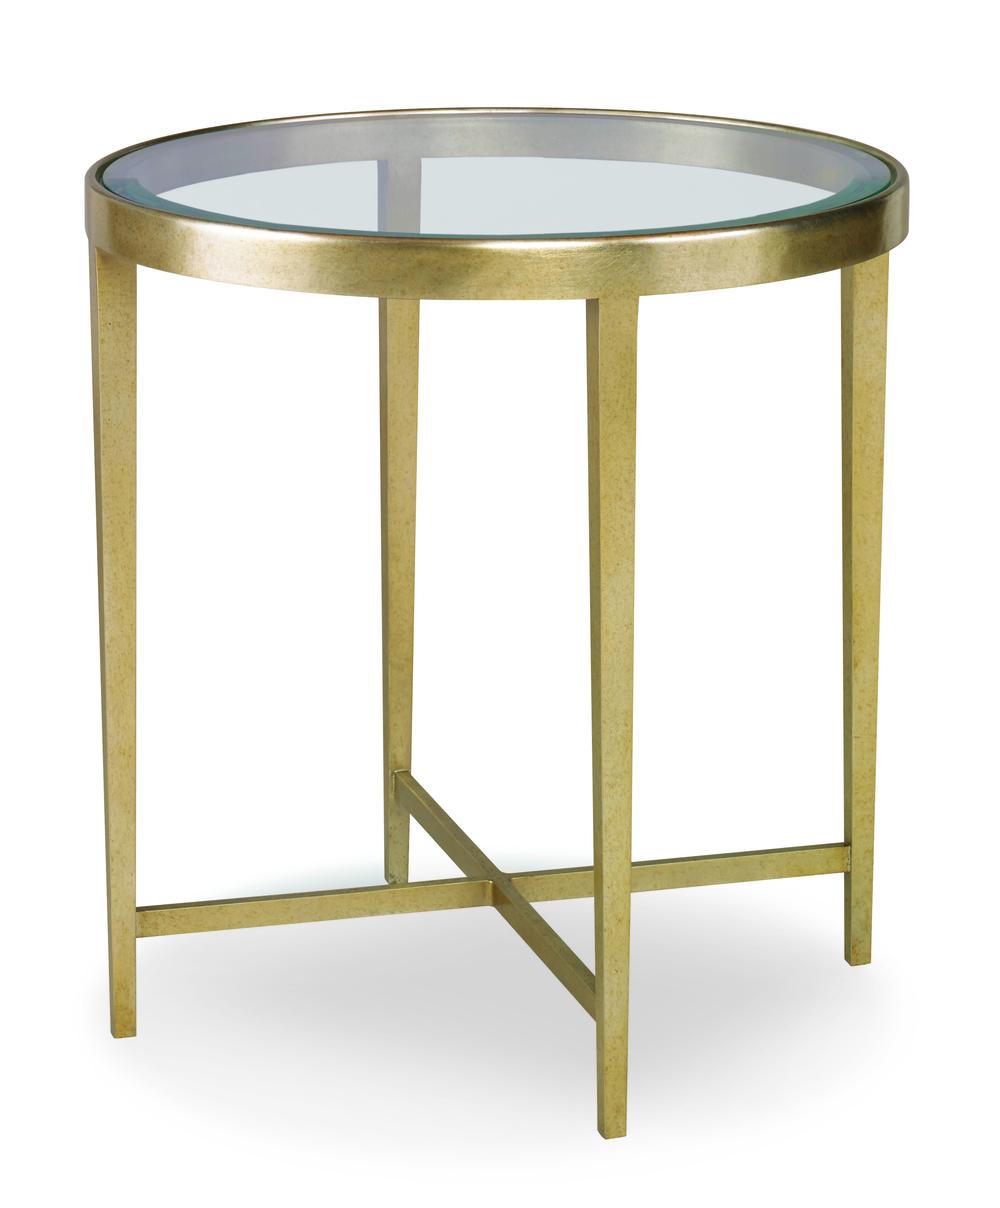 Century Furniture - Wynwood Chairside Table